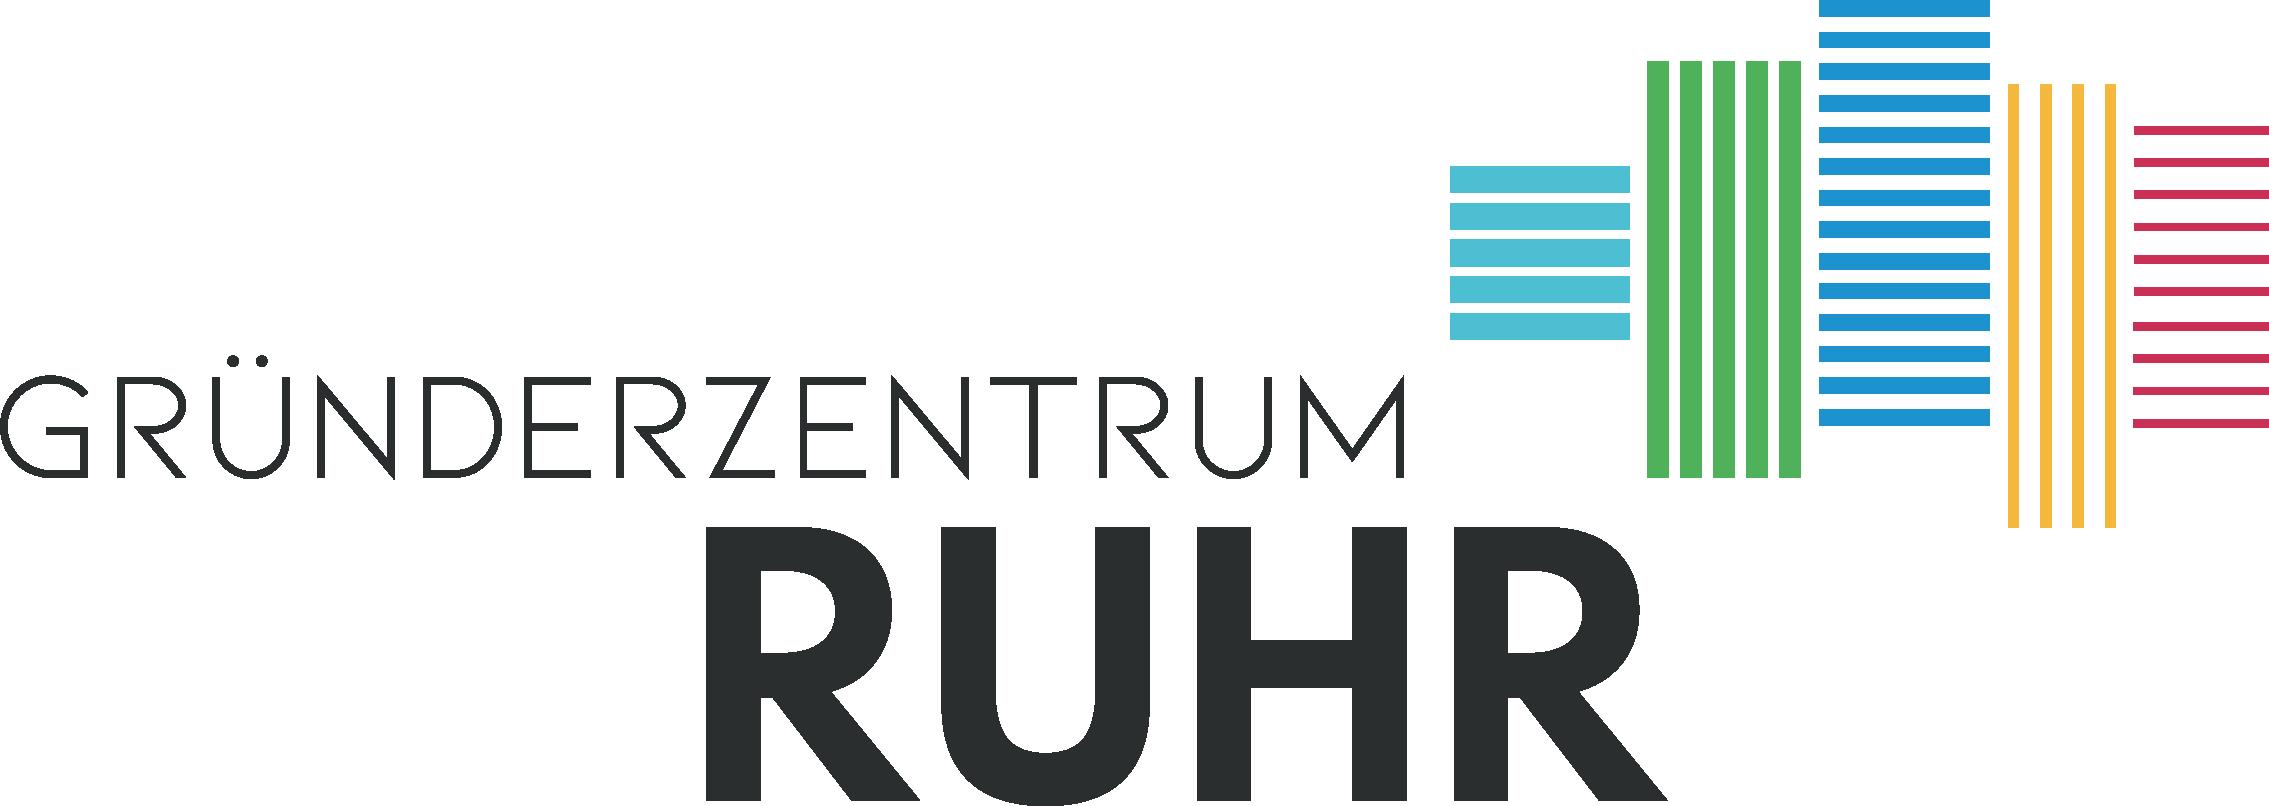 StartUp Beratung Ruhrgebiet Gründerzentrum Ruhr Lionel Benny Lukas Neweling